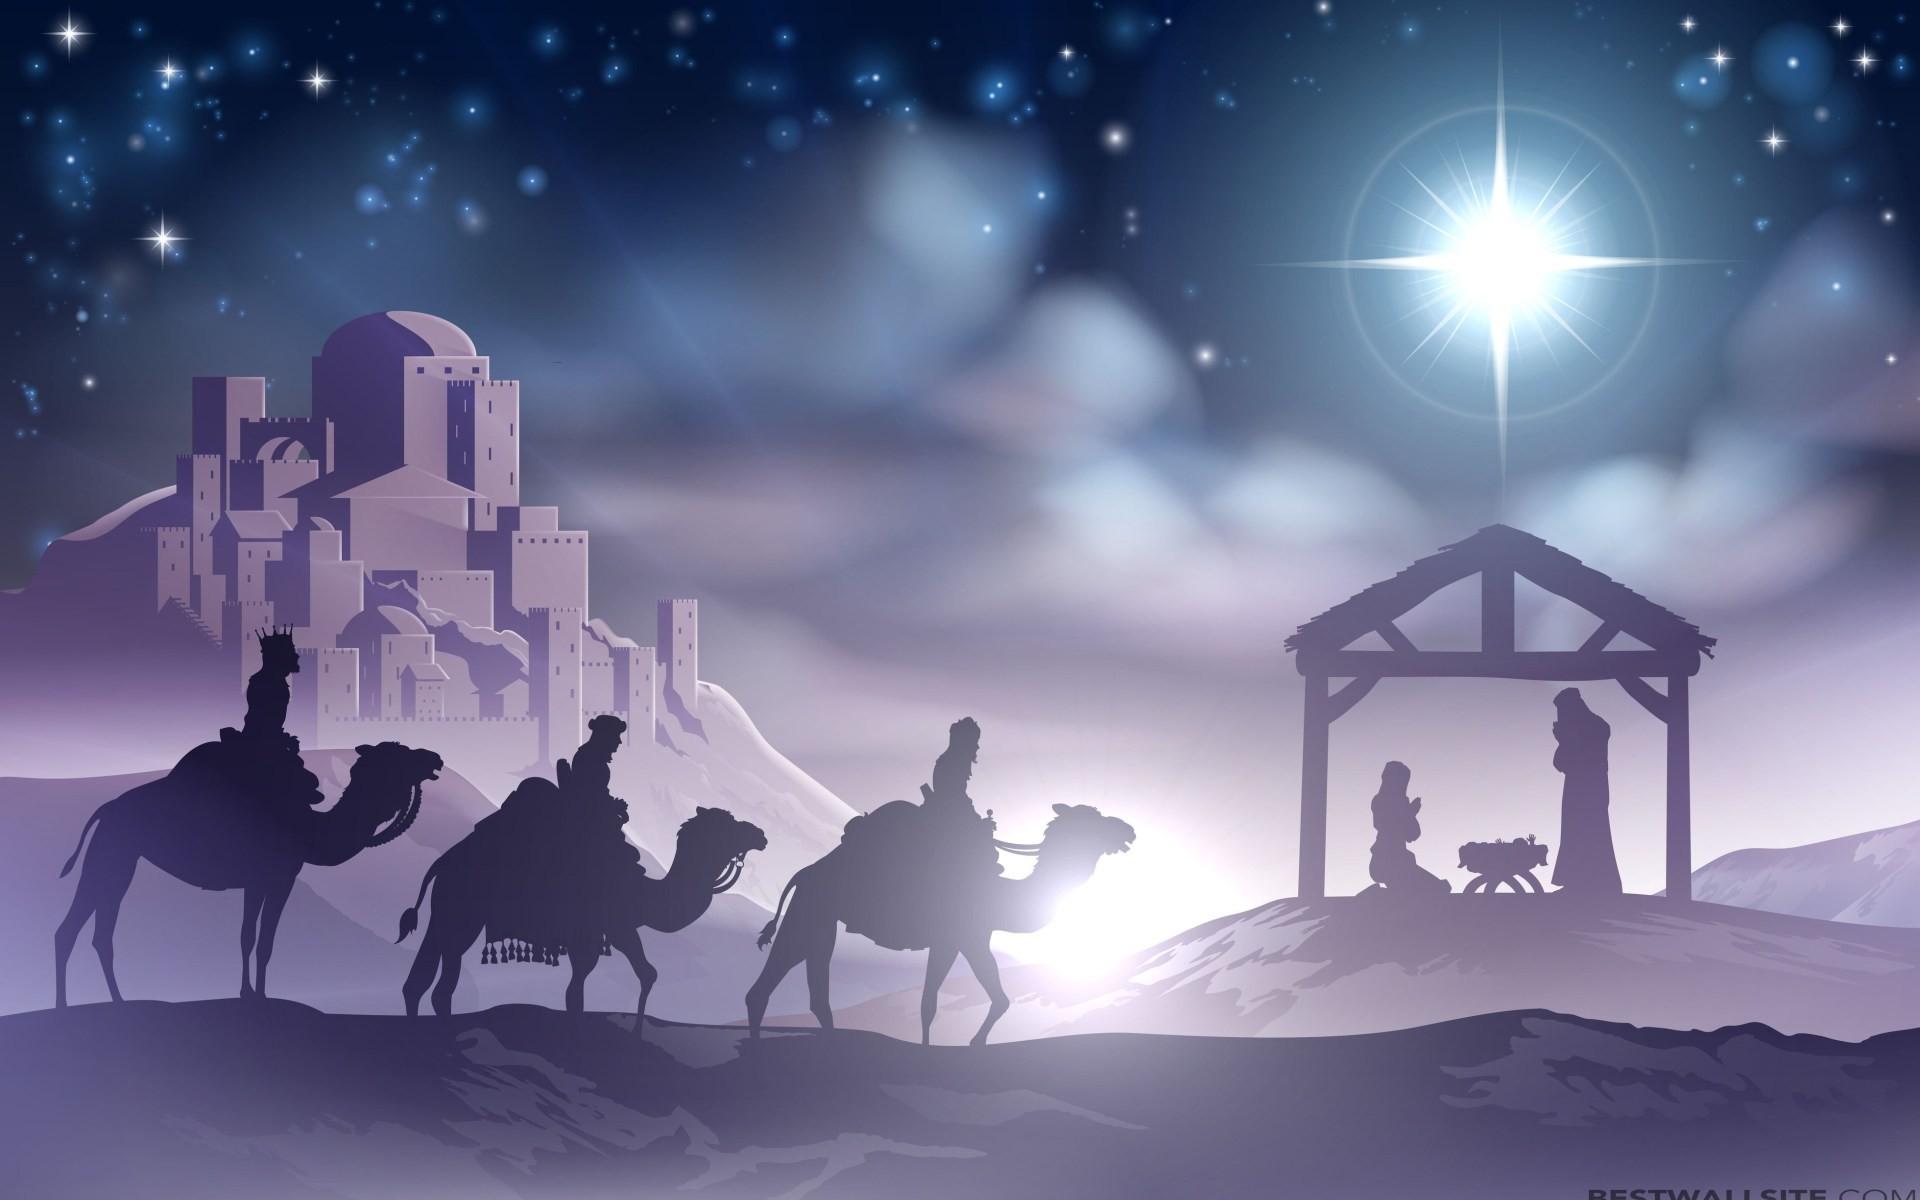 Christmas Eve Nativity Scene